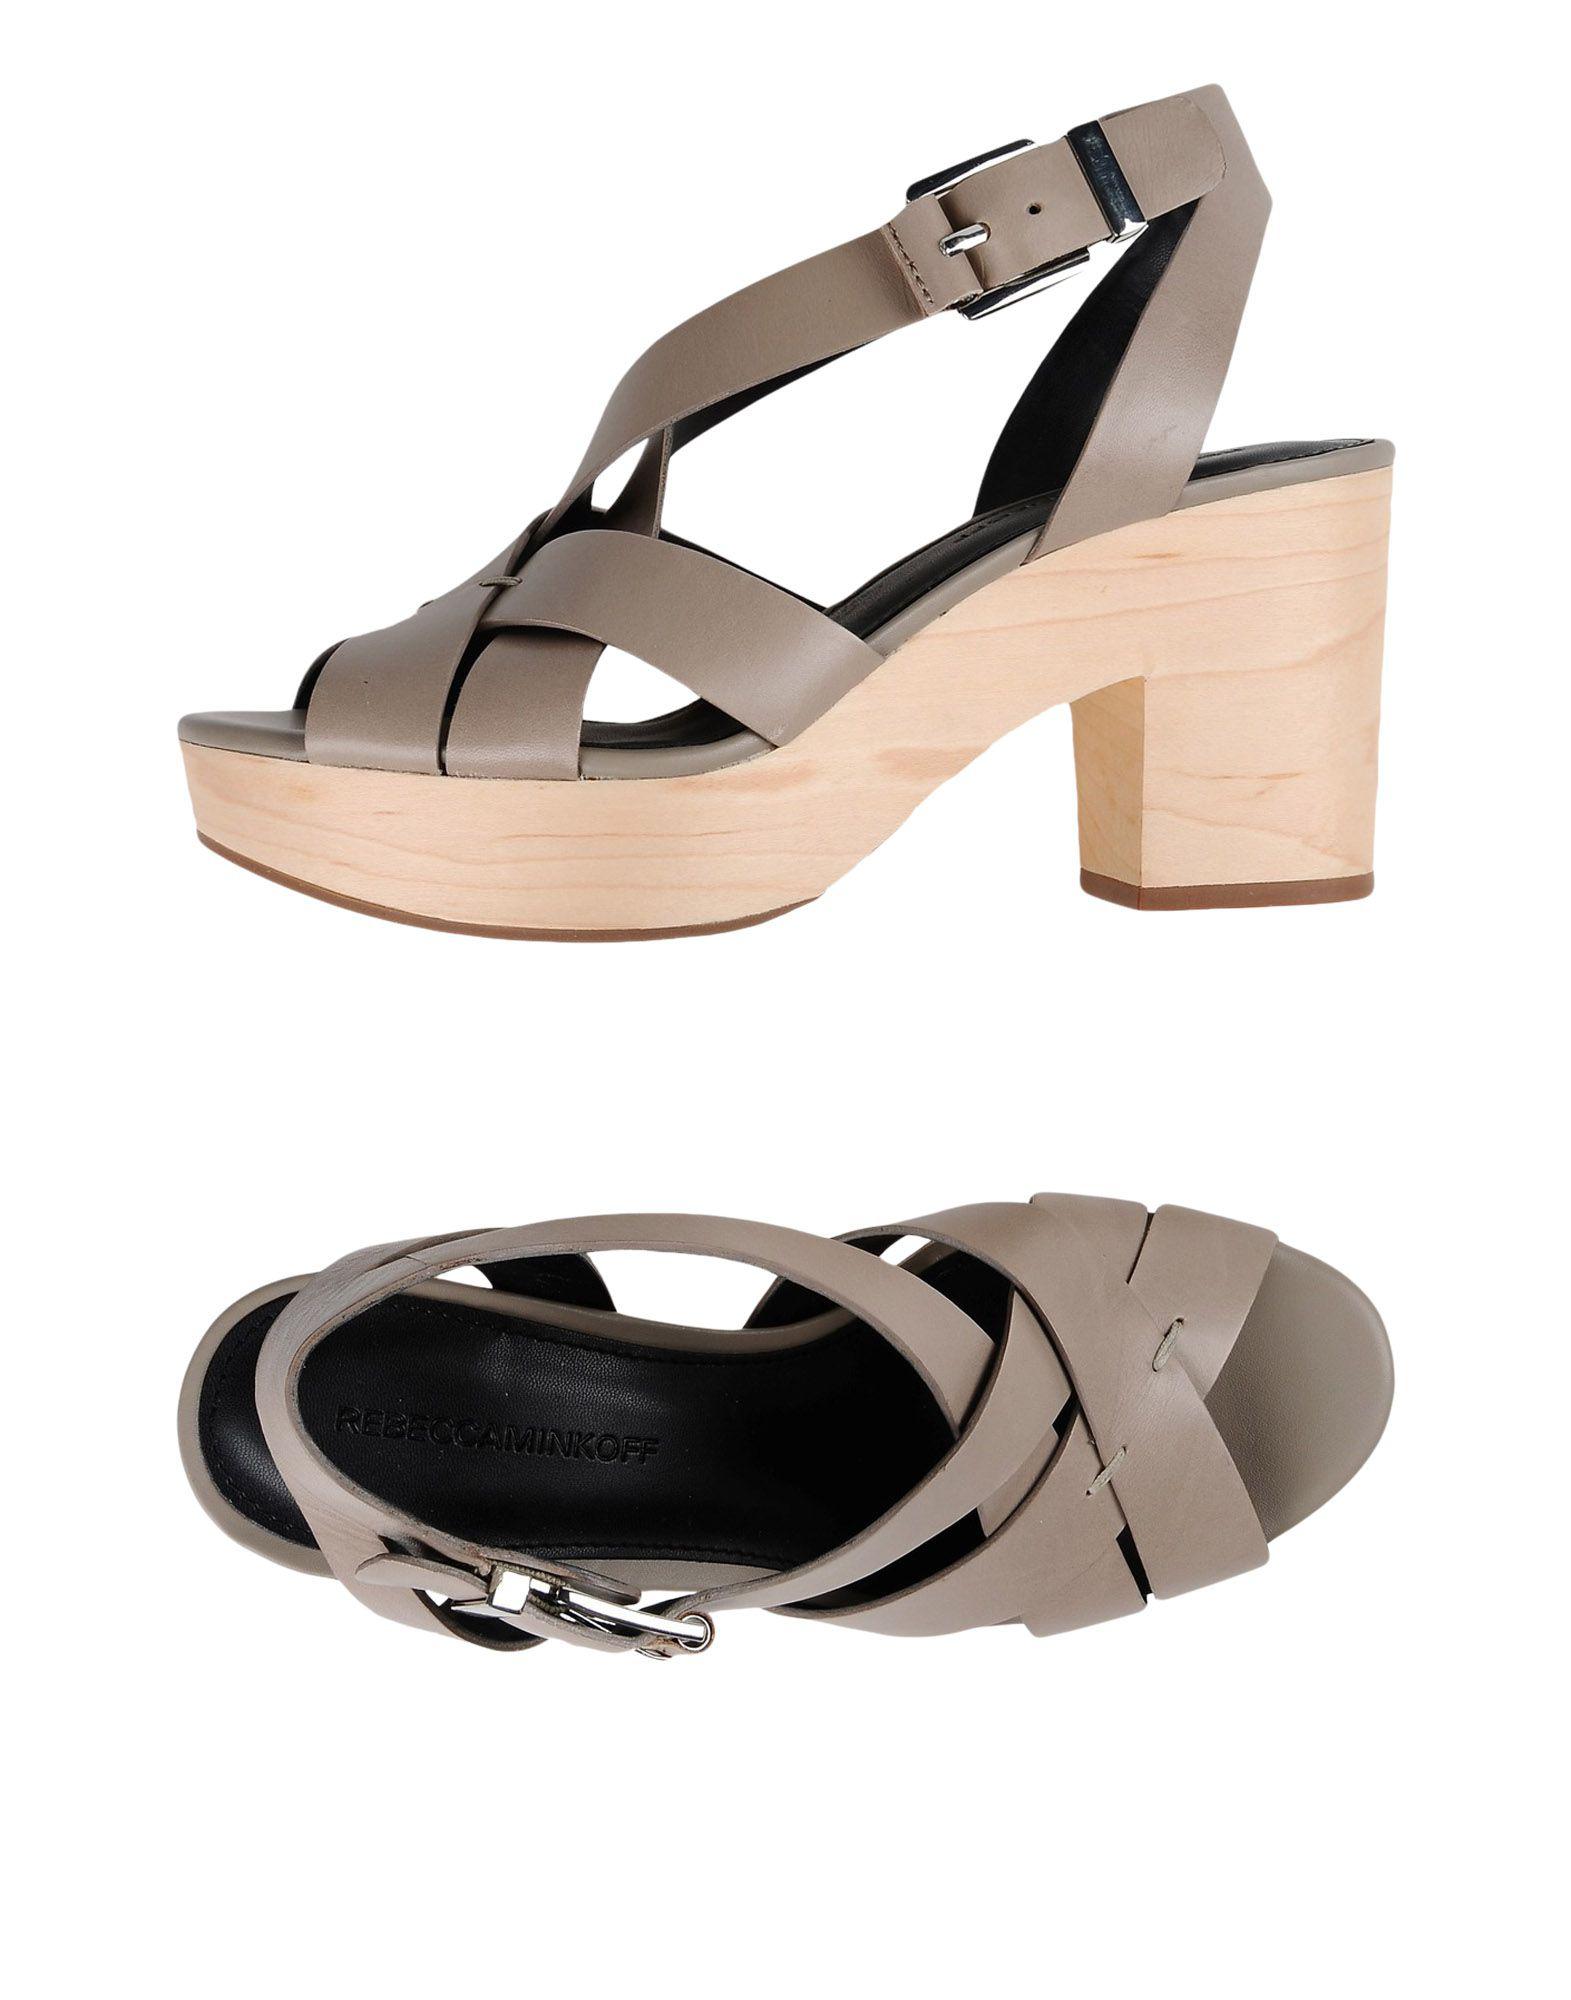 Rebecca Minkoff Sandals In Grey